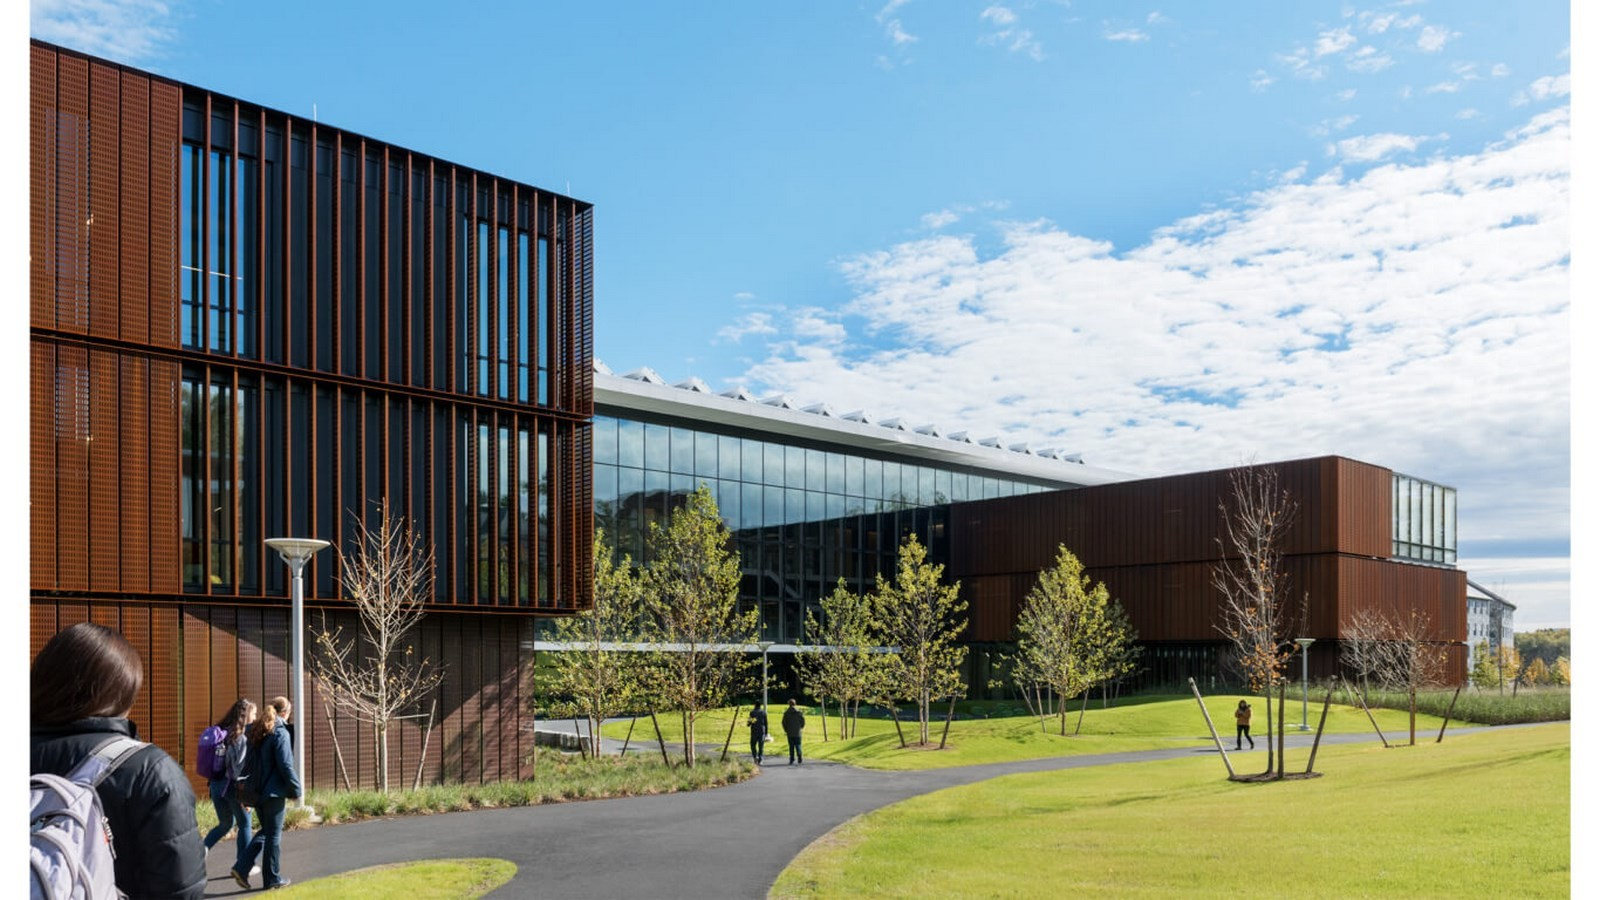 Amherst College Science Centre, Amherst, Massachusetts - Sheet1